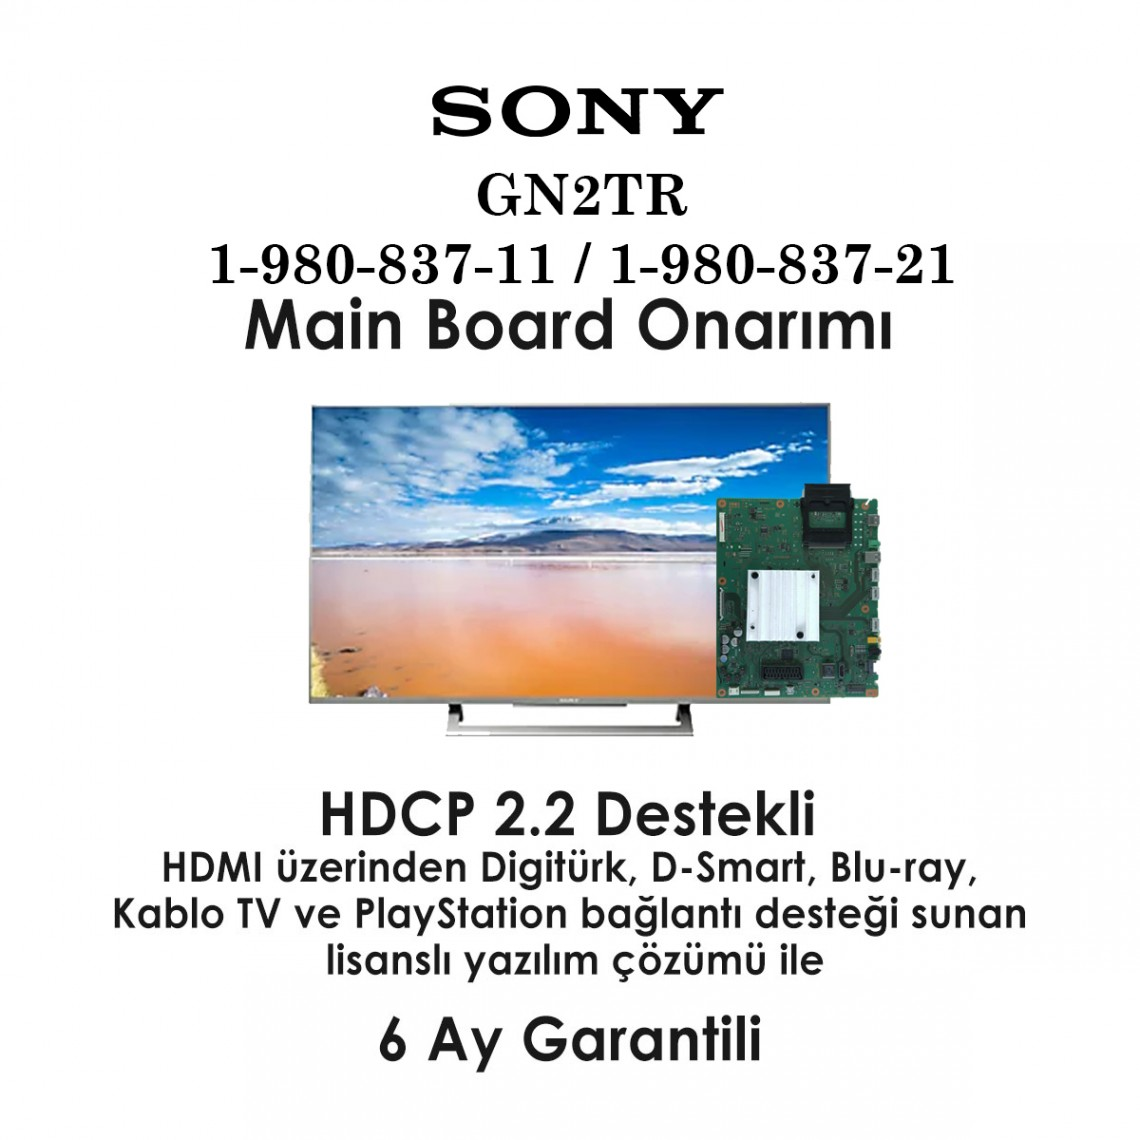 SONY, GN2TR, 1-980-837-11, 1-980-837-21, KD-43XD8005 KD-43XD8077, KD-43XD8088, KD-43XD8099, KD-43XD8305, KD-49XD7004, KD-49XD7005, KD-43XD8305, KD-49XD805, KD-65ZD9, KD-65ZD9, KD-75ZD9, KD-75ZD9, KD-100ZD9, Main Board Onarımı